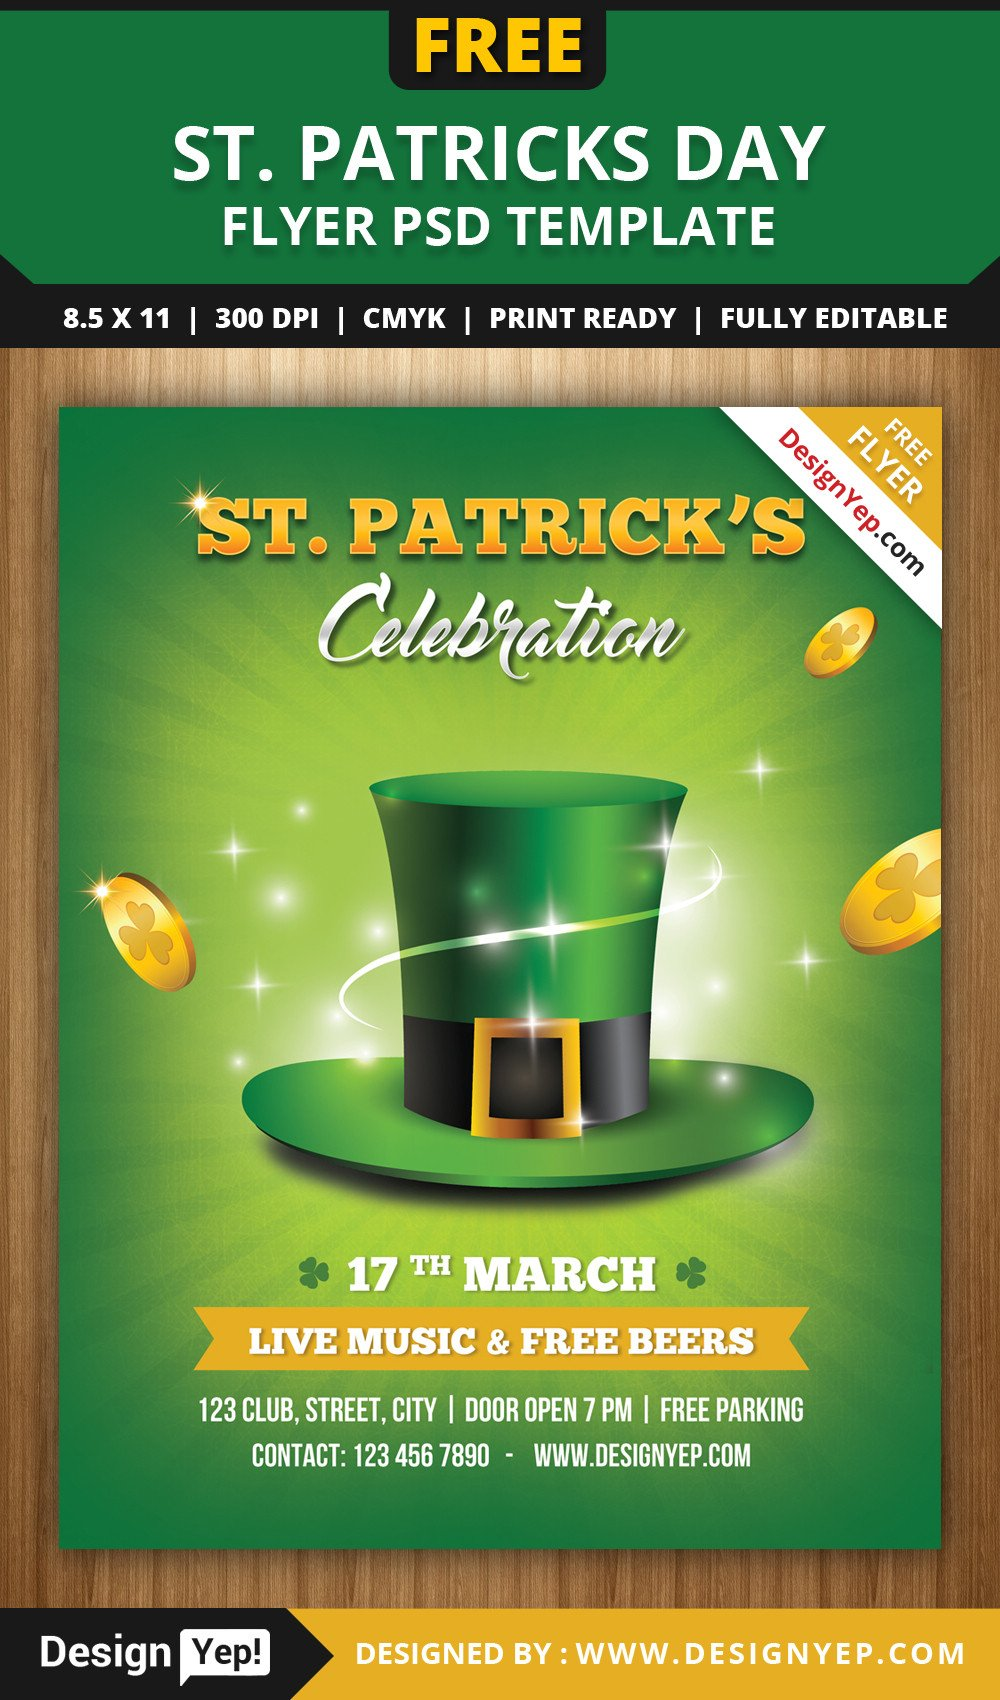 St Patrick Day Flyer Free St Patricks Day Flyer Template Psd Designyep